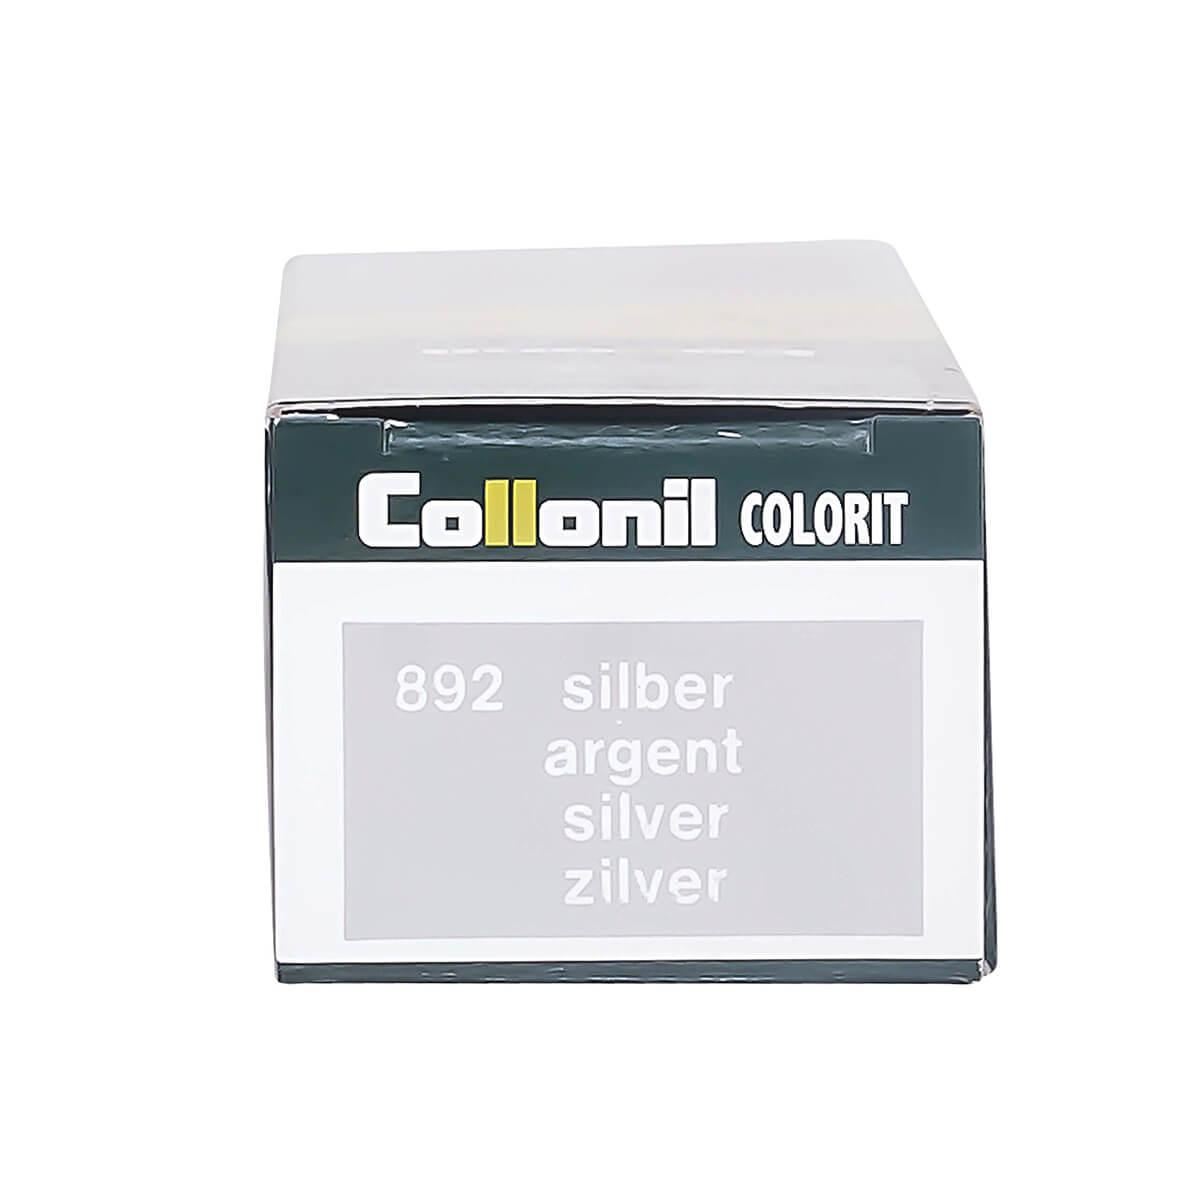 Collonil Creme COLORIT Silber